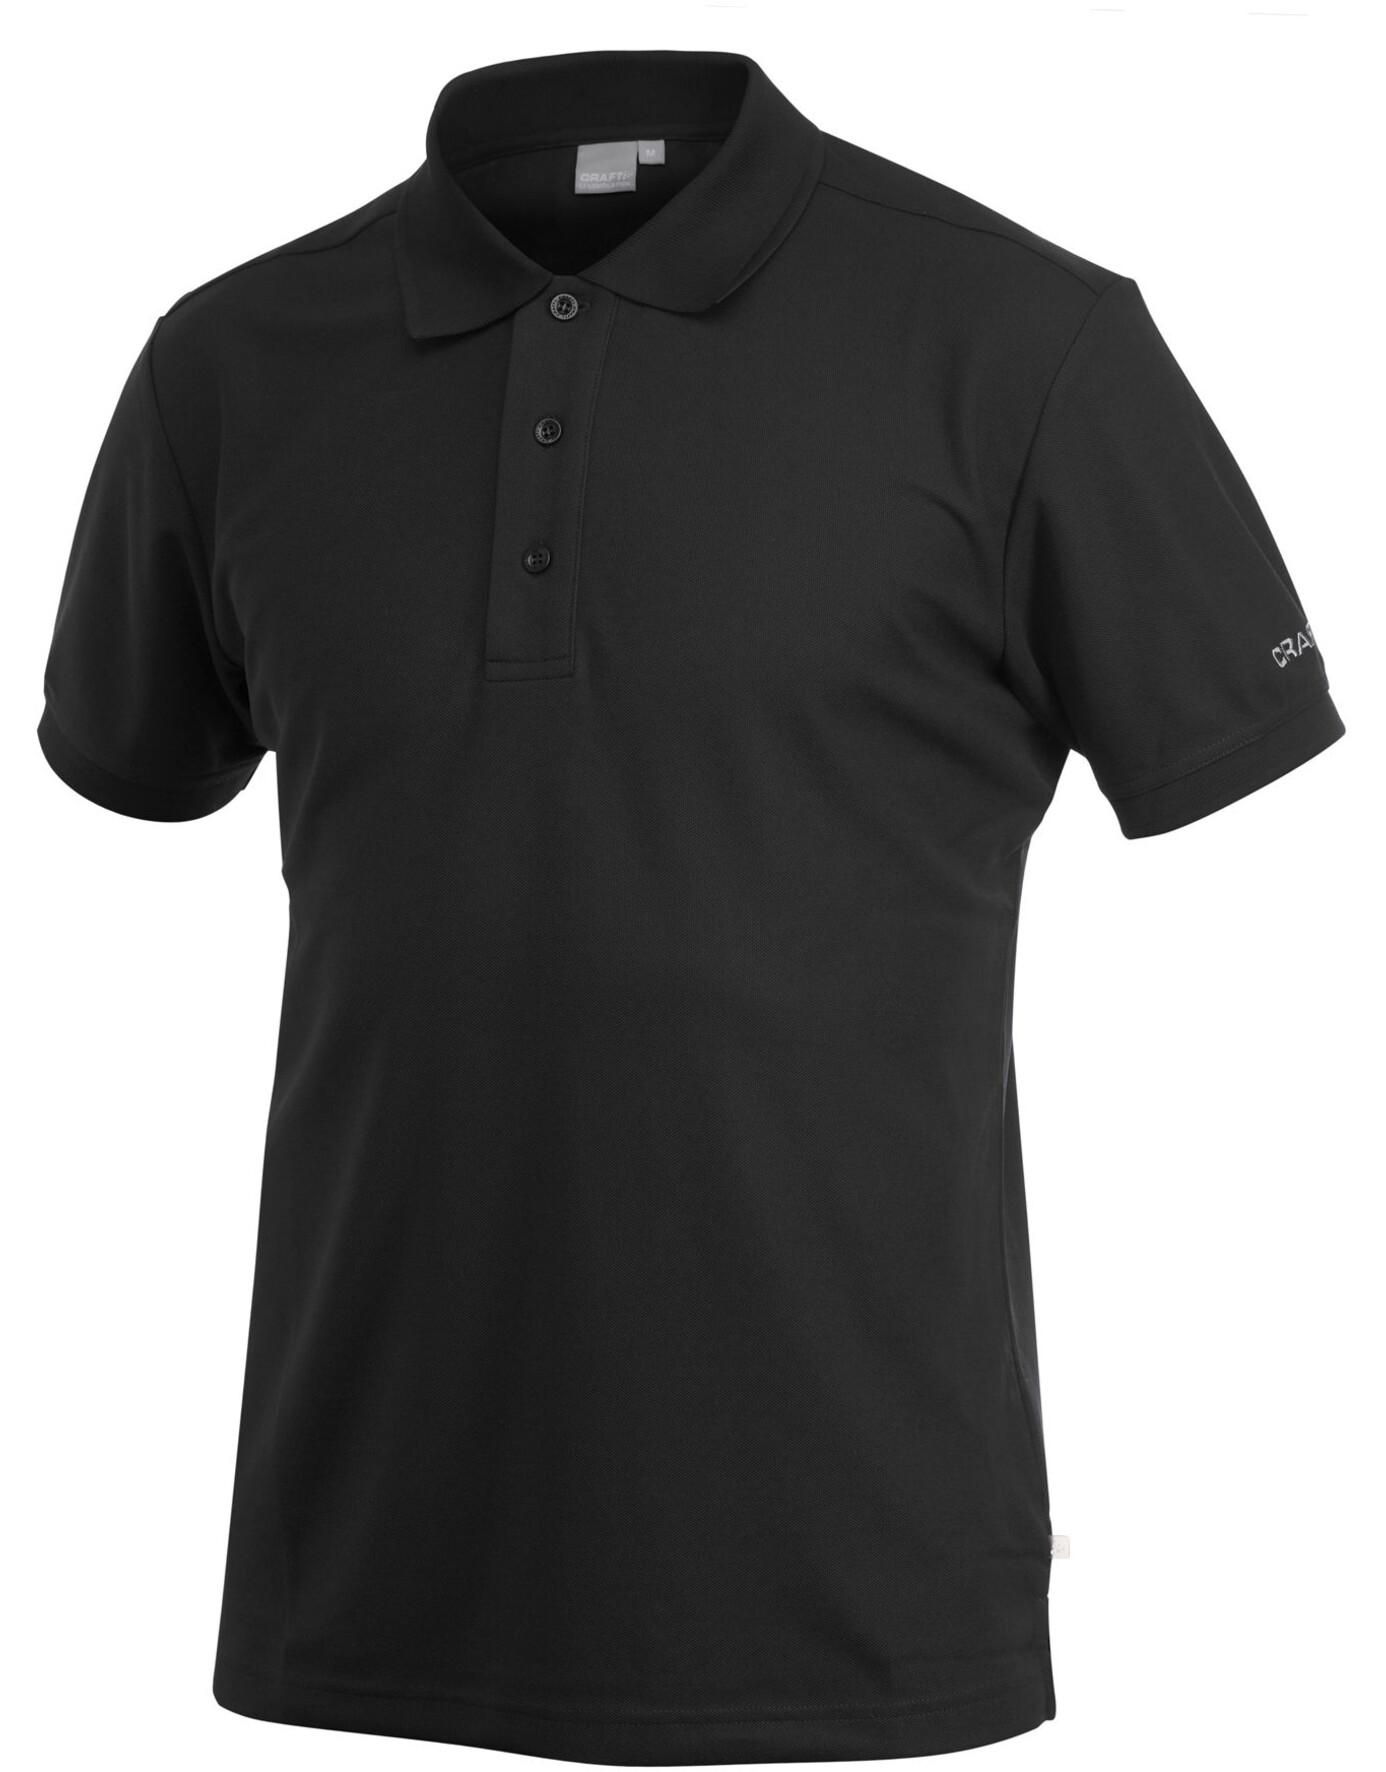 4a38d0654 Craft Classic Polo Pique T-skjorte Svart